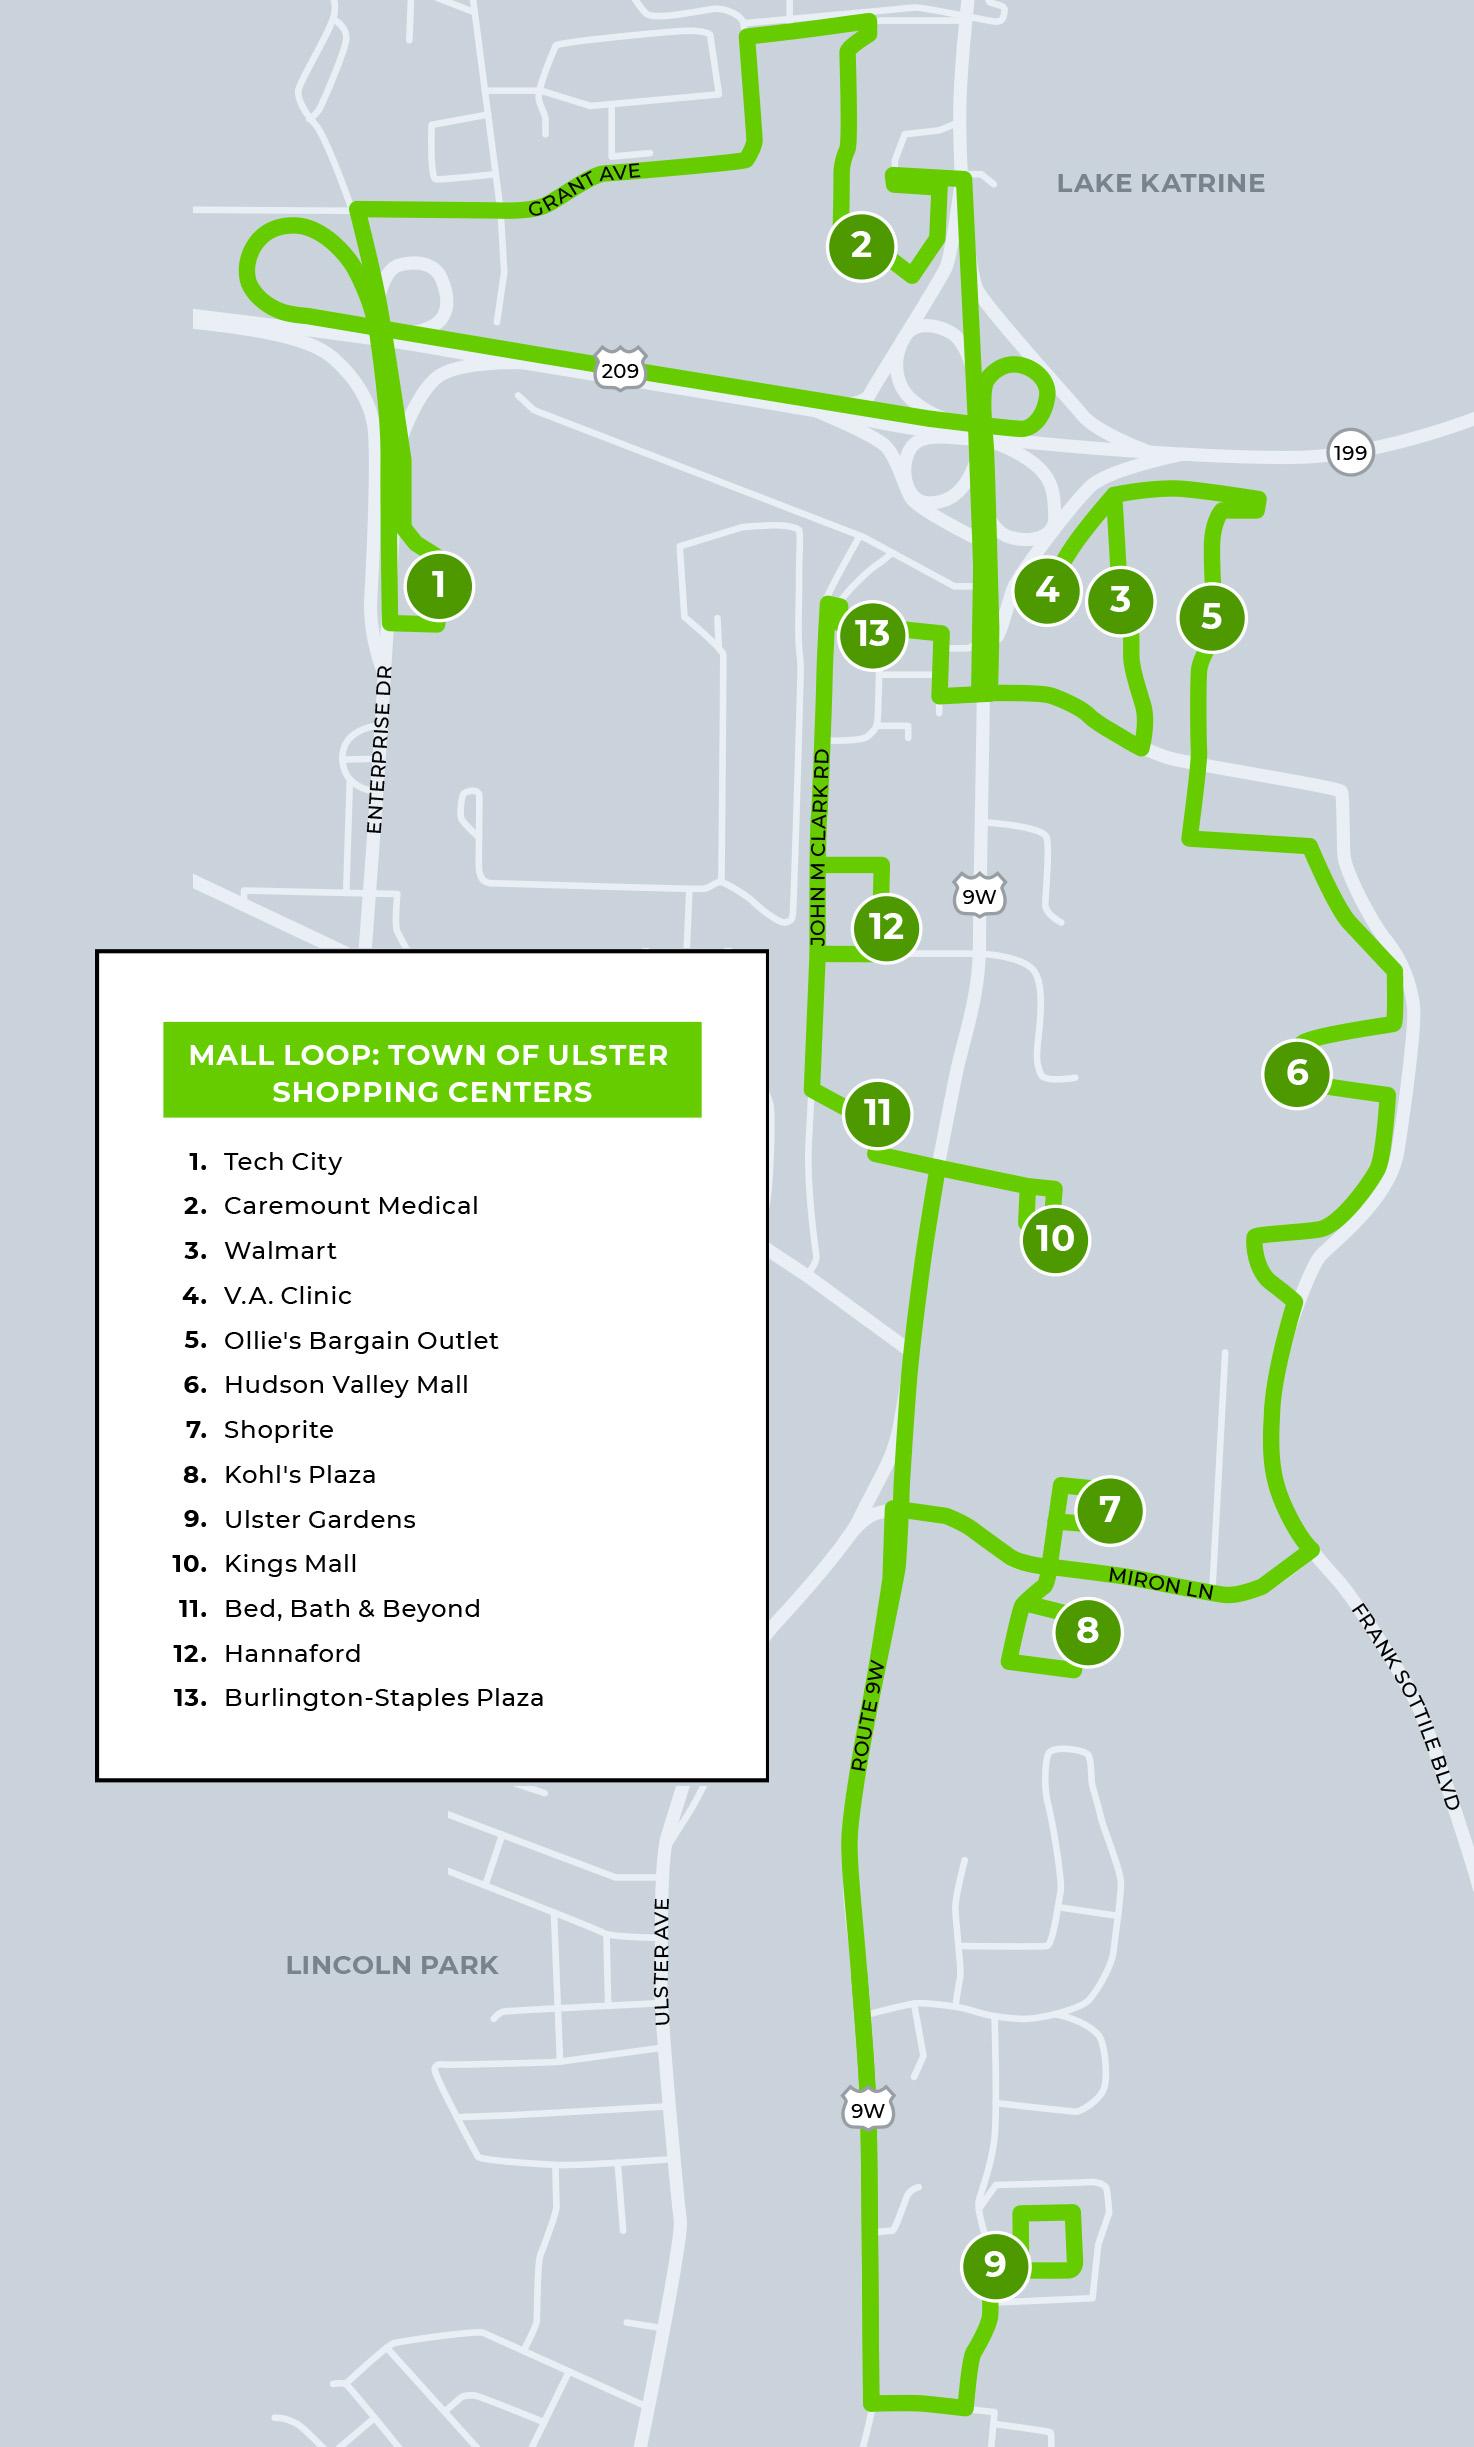 mall loop map